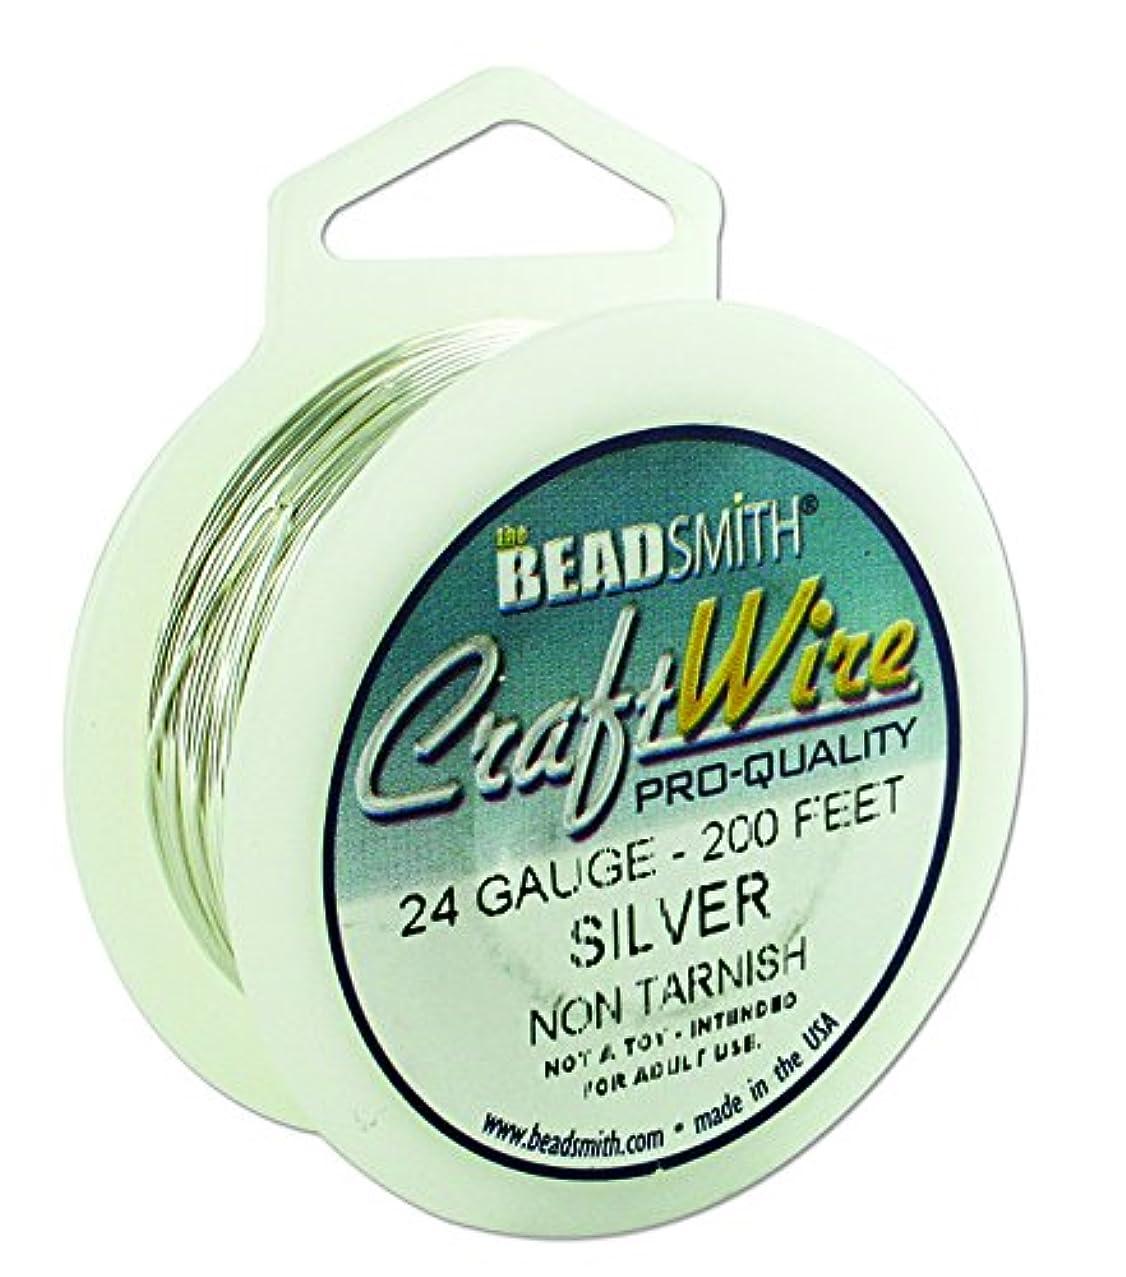 Beadsmith Non Tarnish Craft Wire (24, Silver) xroiqiuthu245